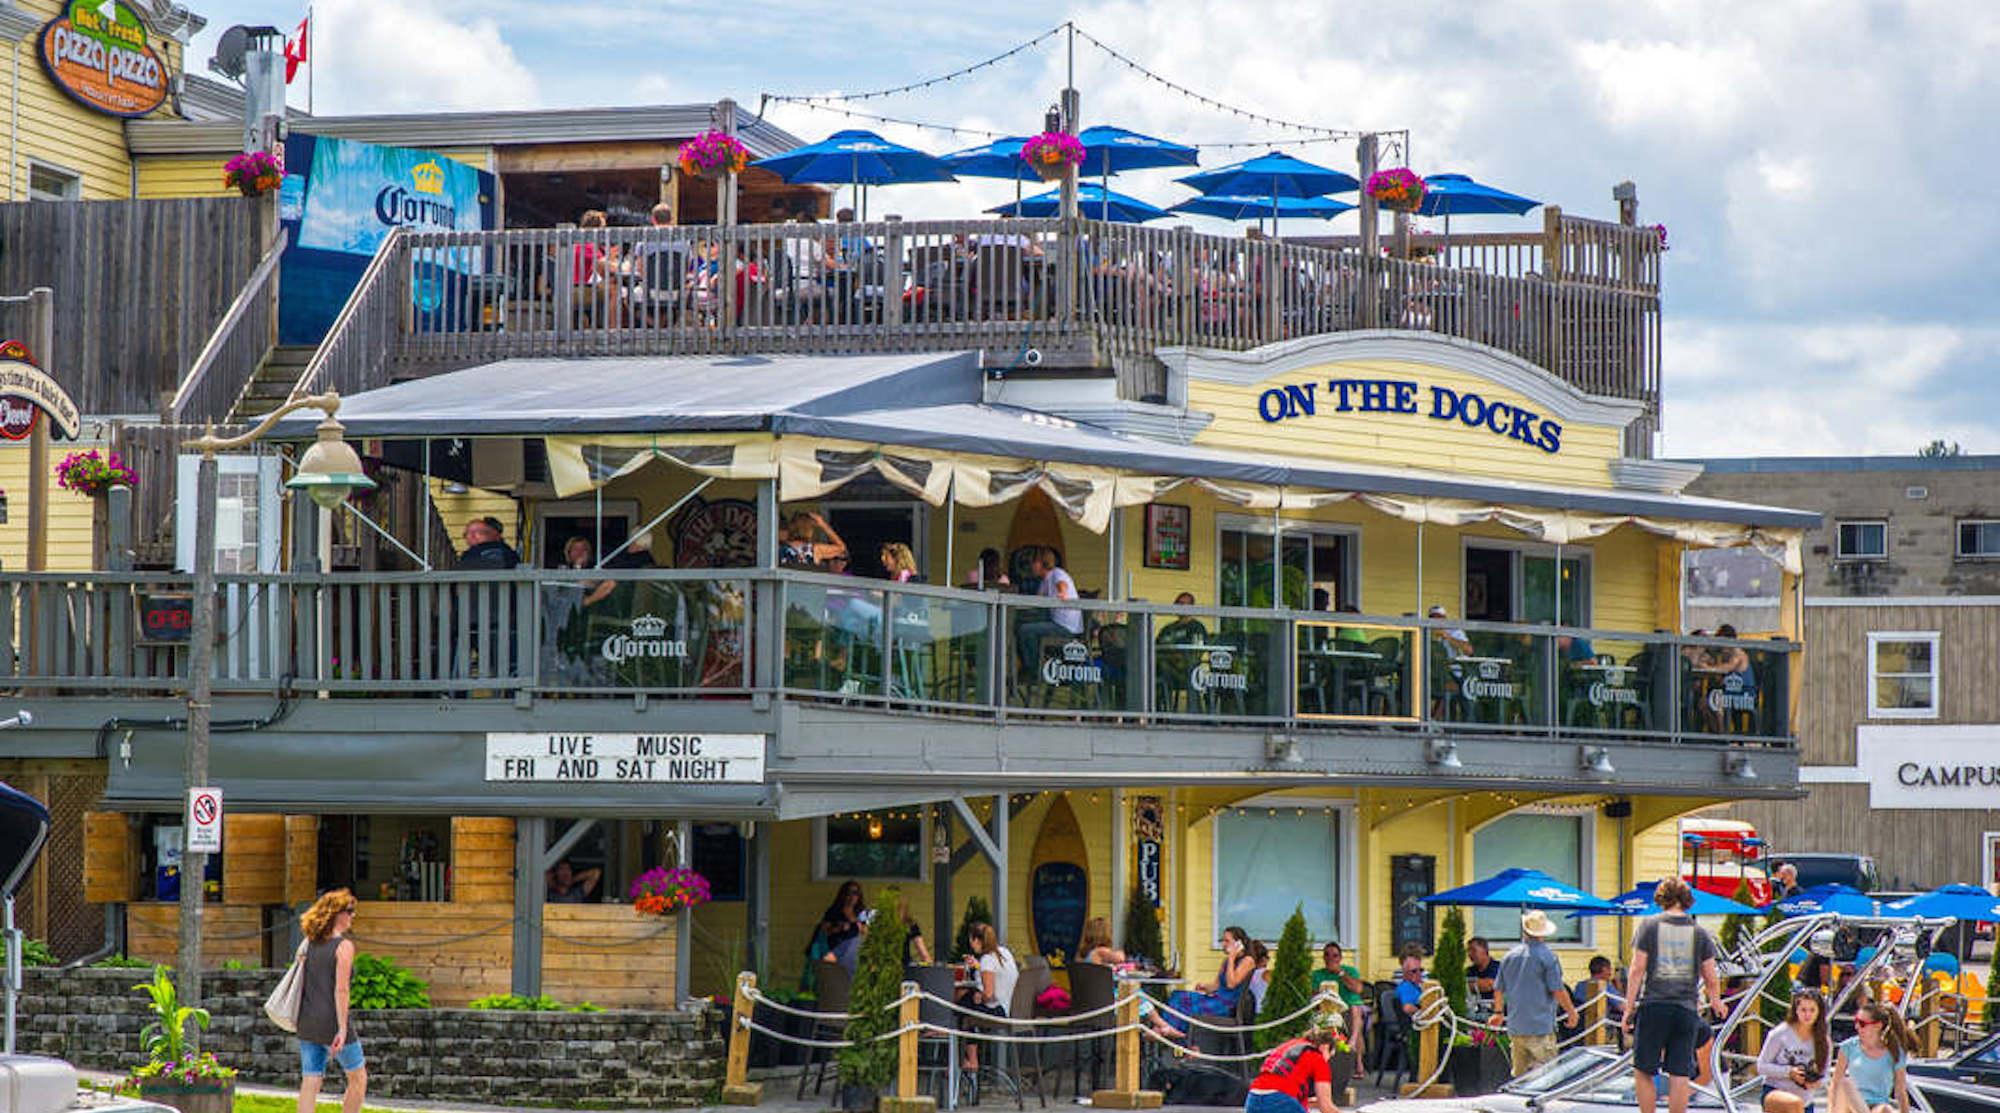 On the Docks Pub Patio